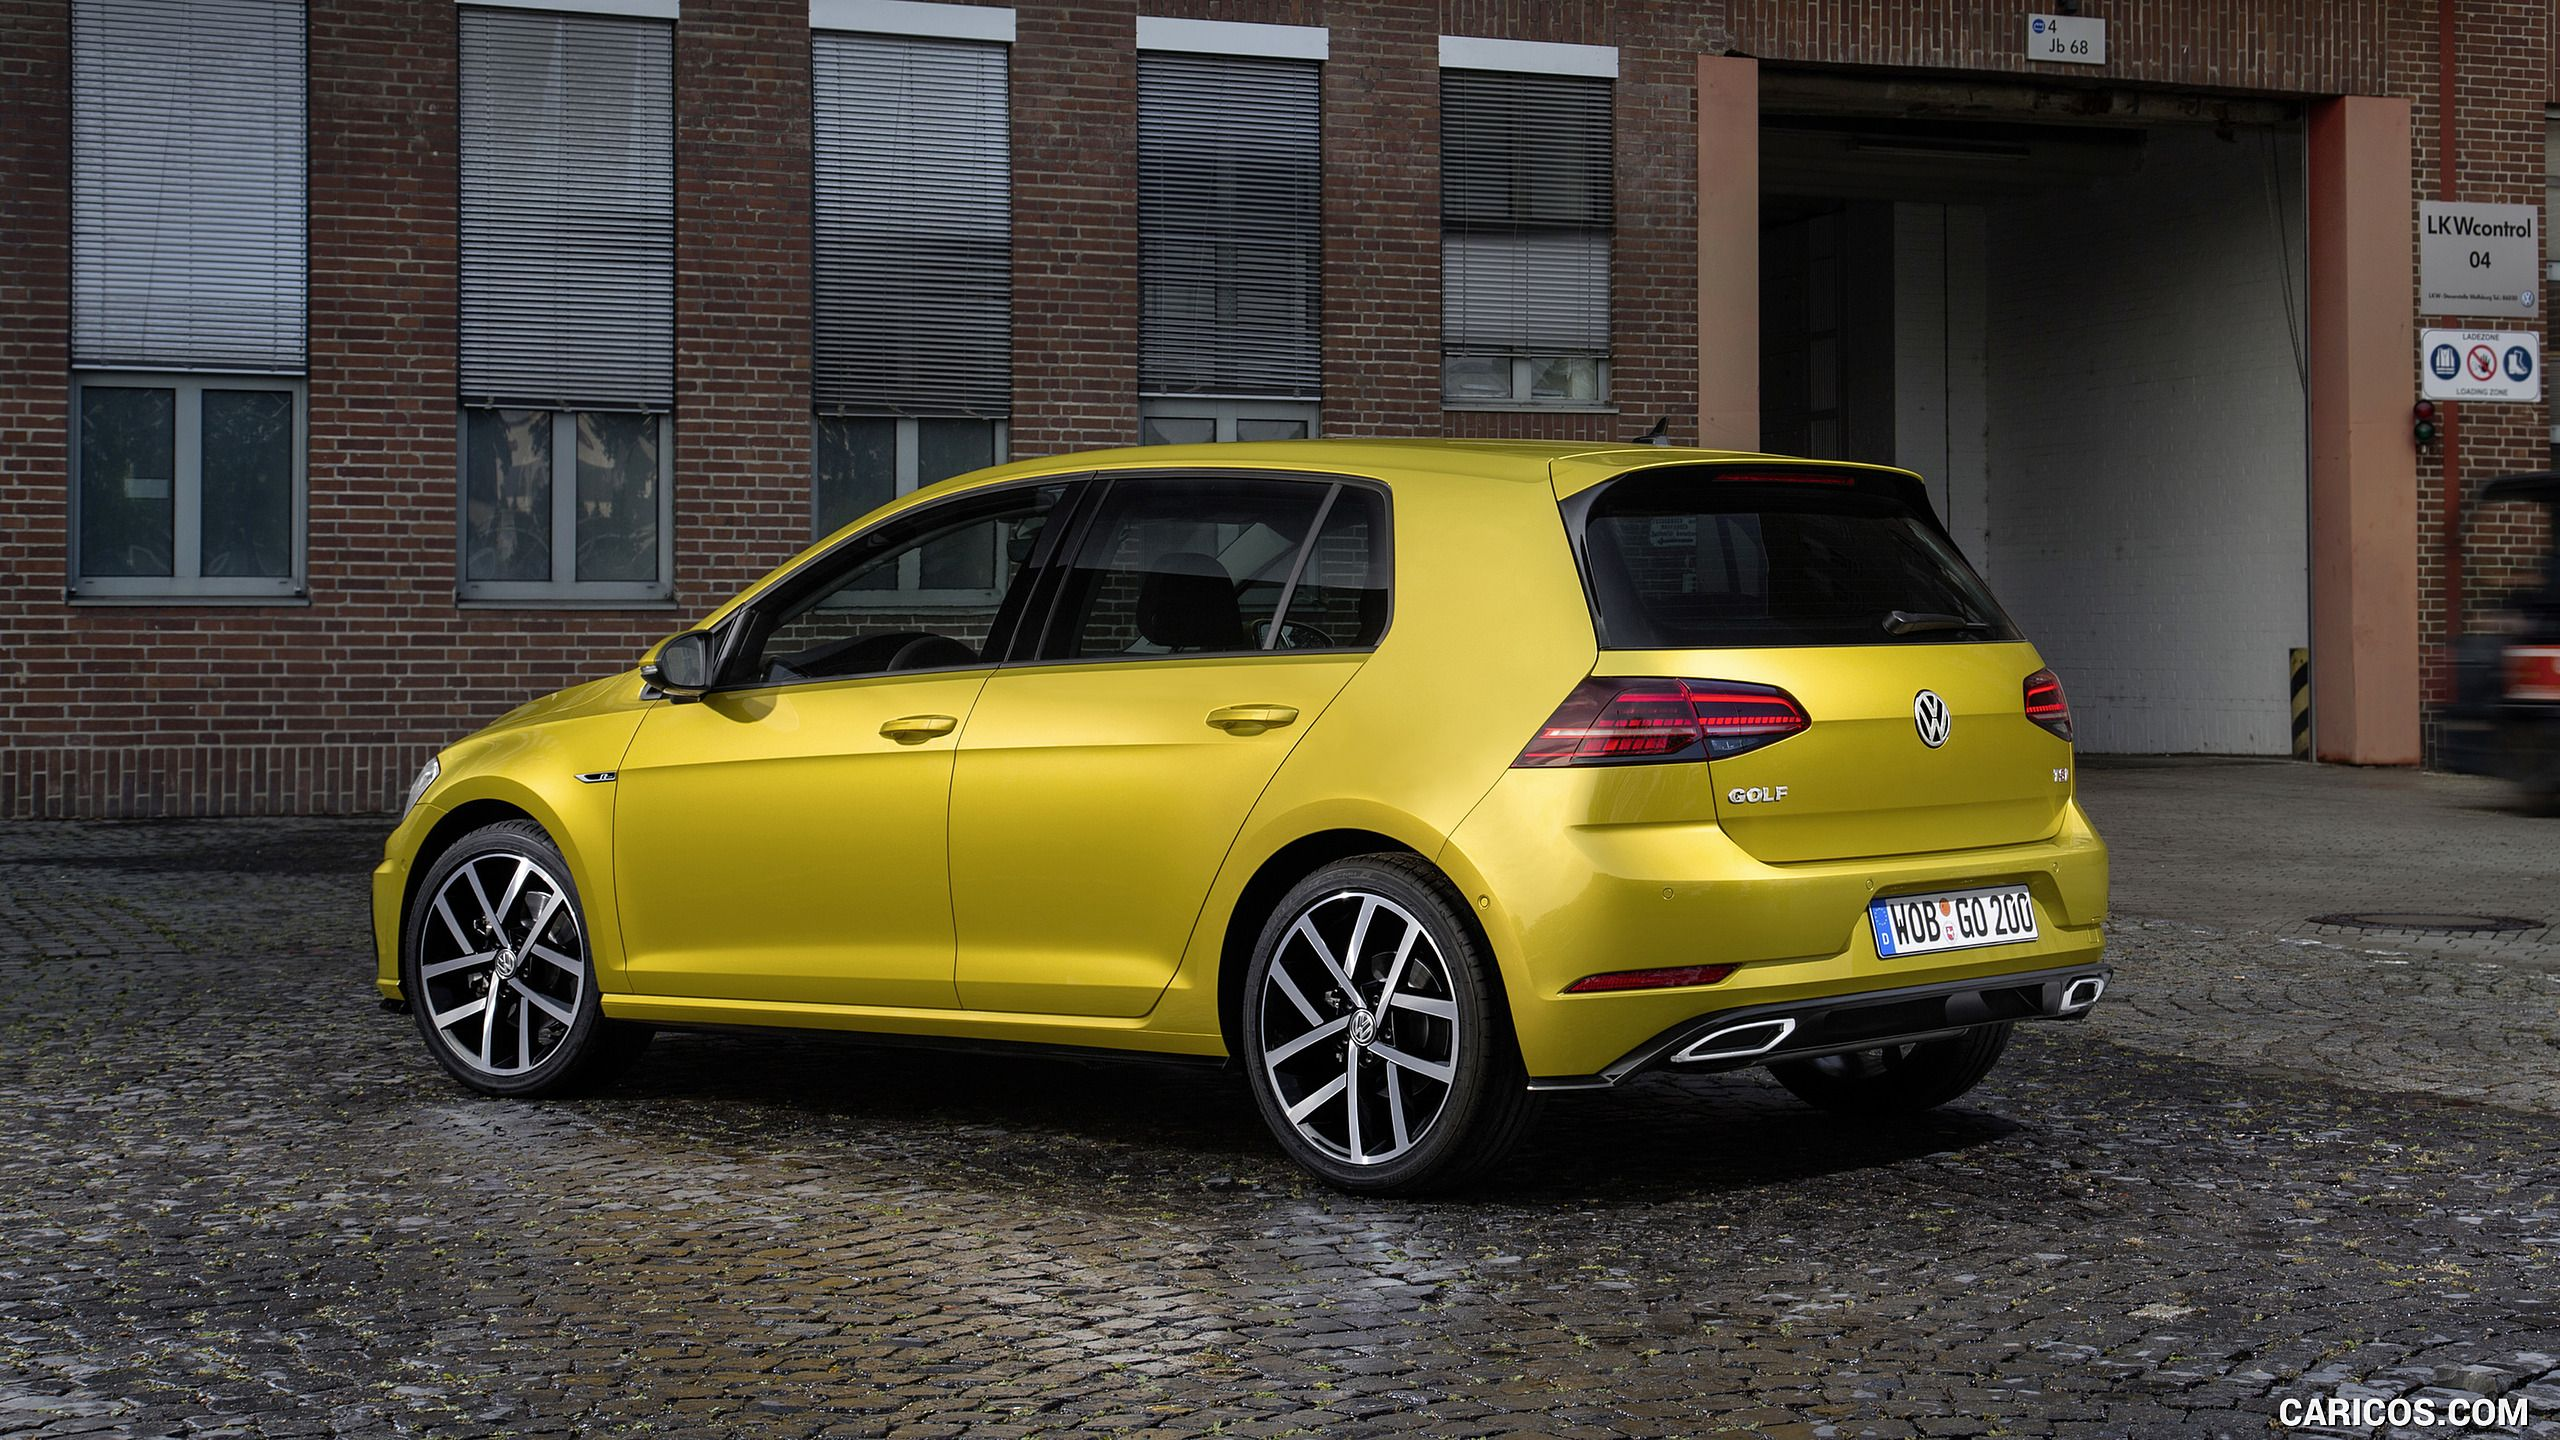 2017 volkswagen golf 7 facelift wallpaper | germany cars | pinterest